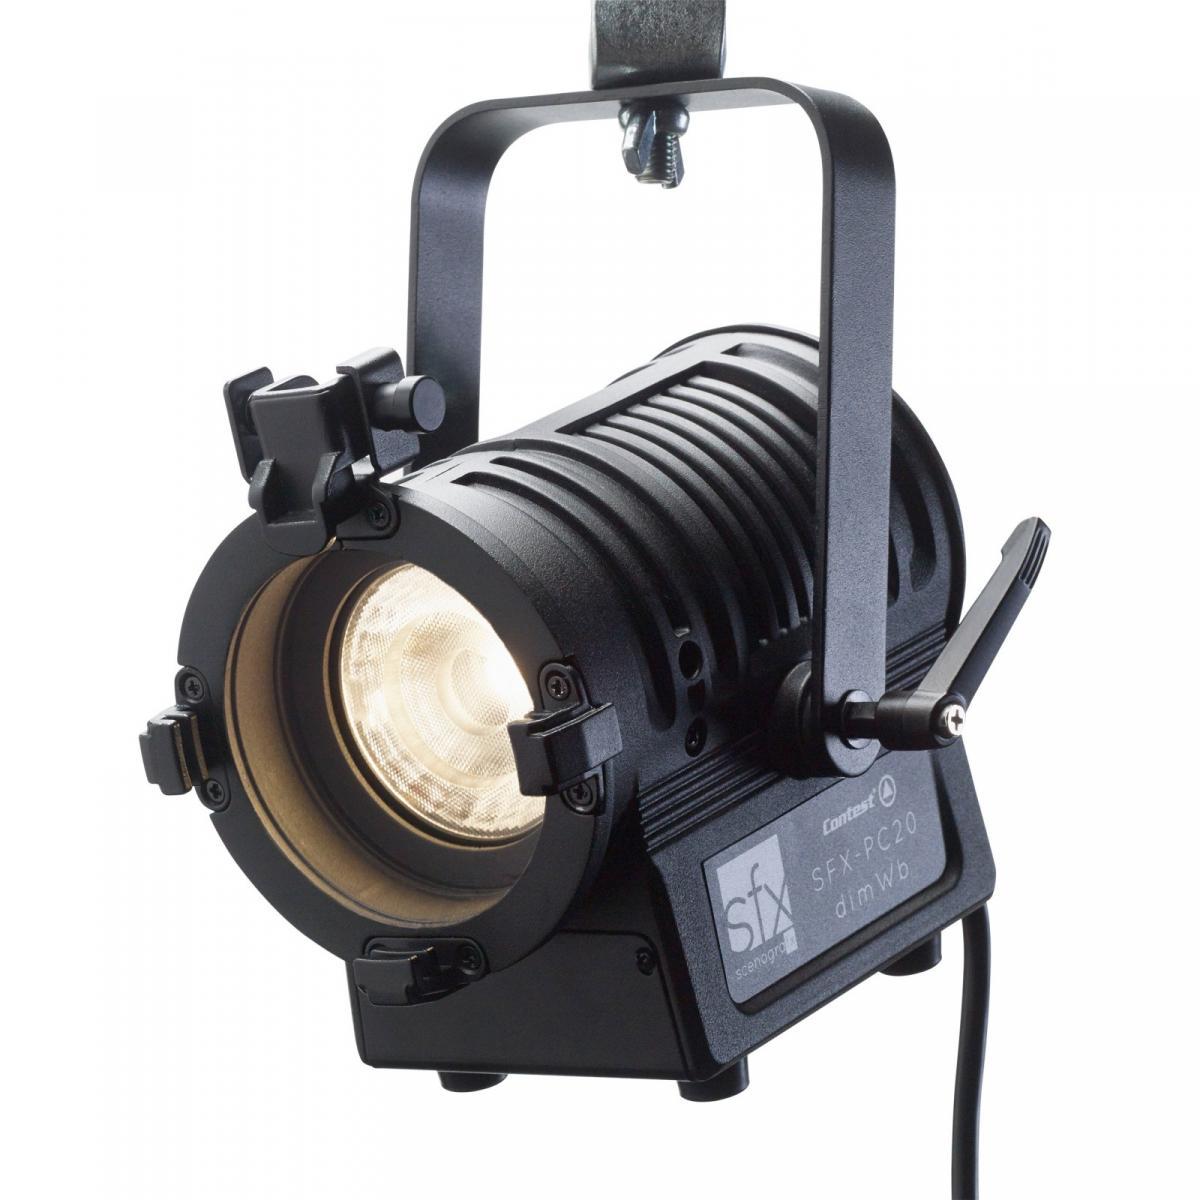 Contest SFX-PC20dimWb LED Theaterscheinwerfer